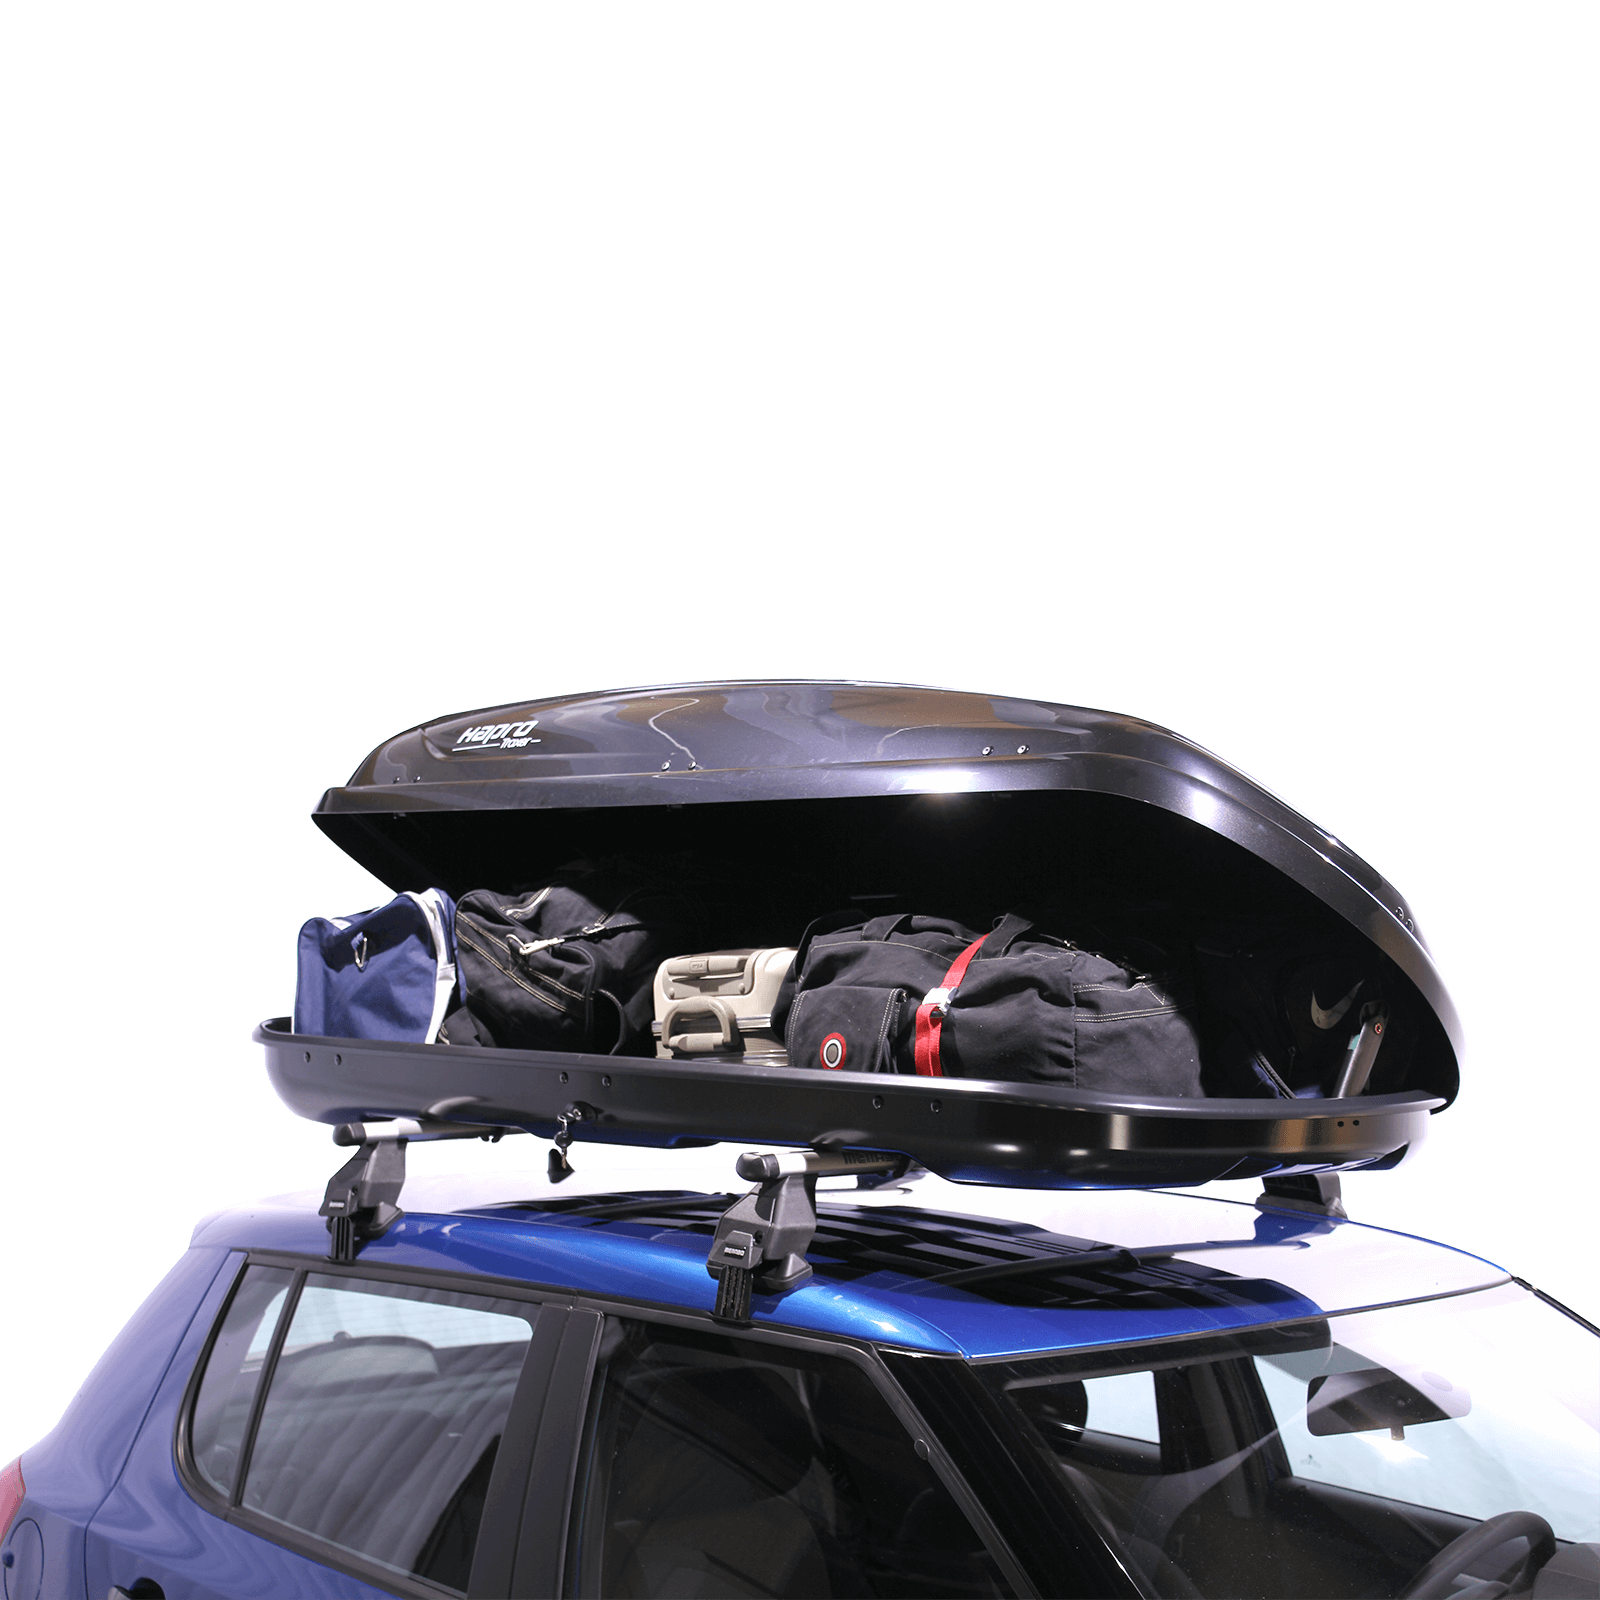 Dachbox Hapro Traxer 6.6 Brilliantblack - Bild 3